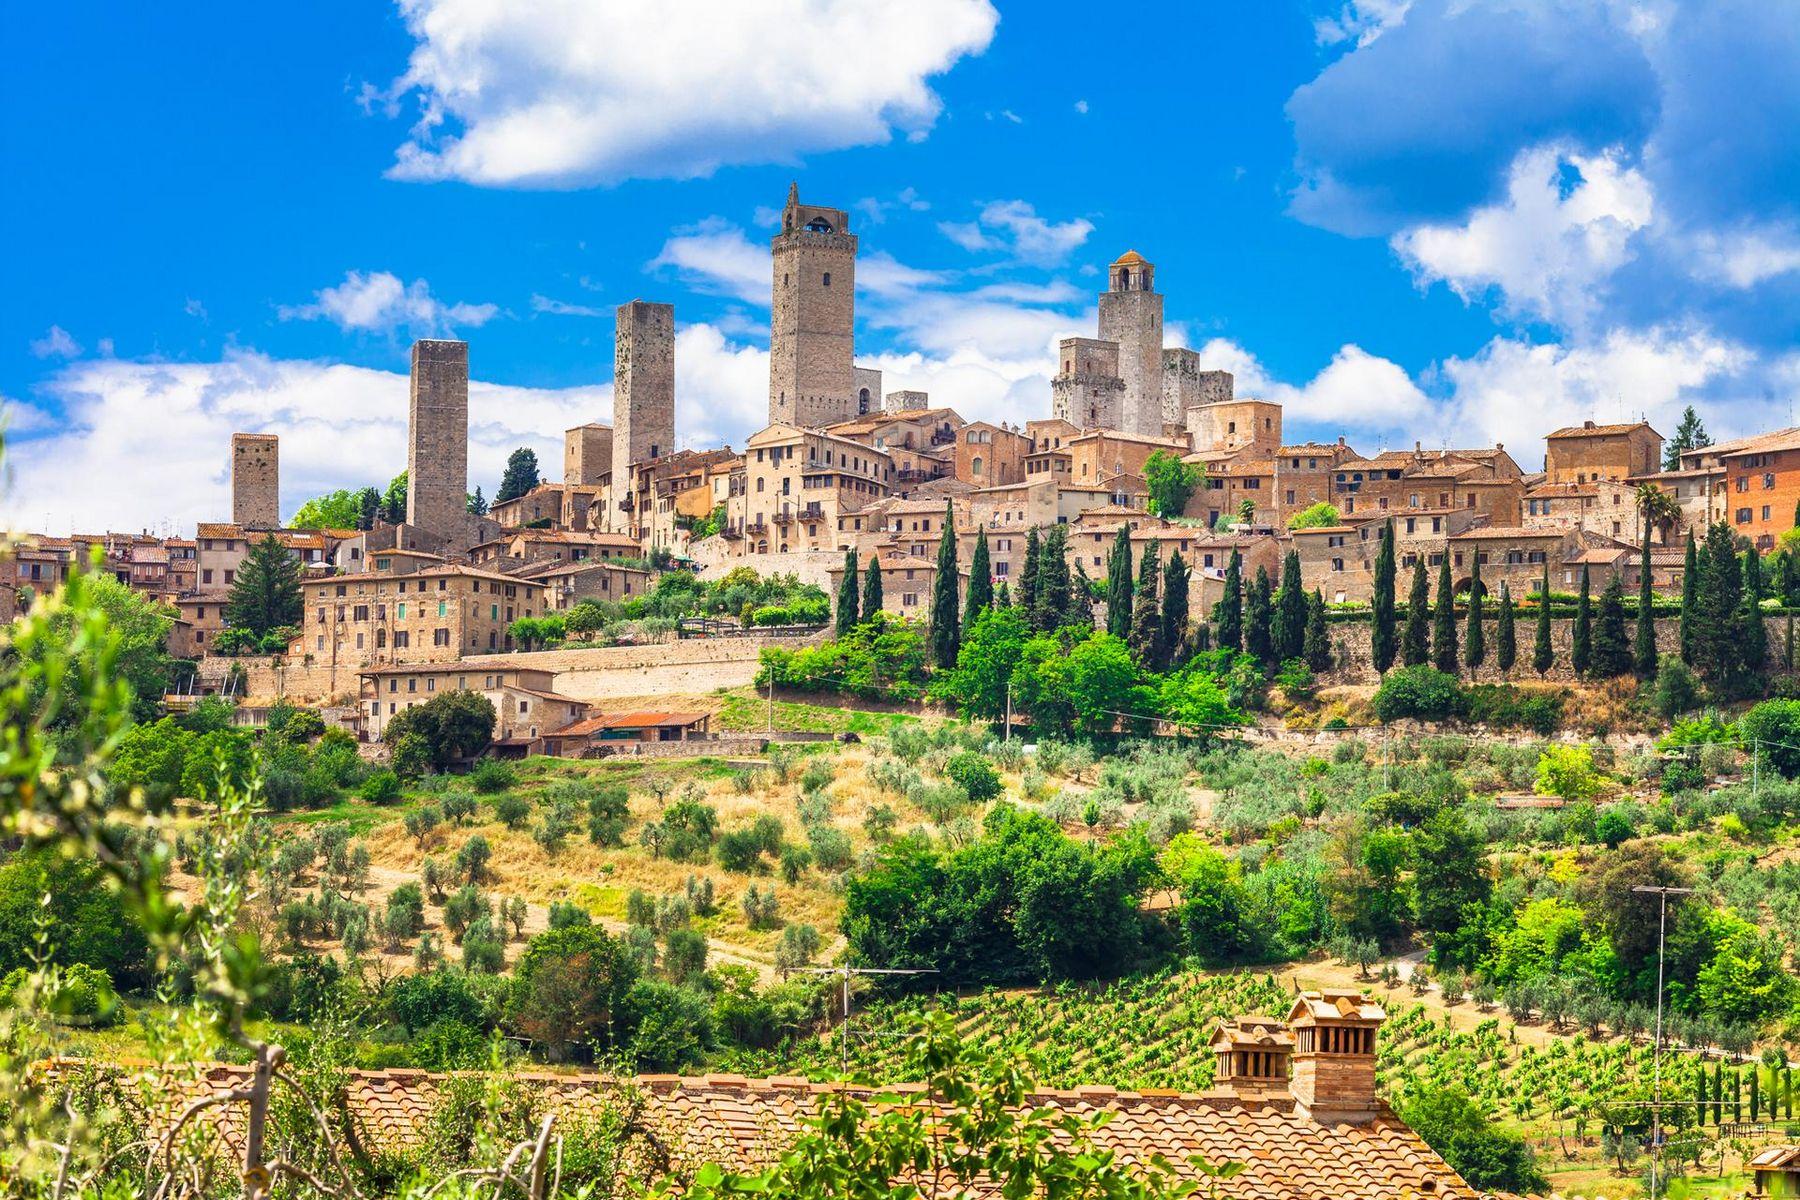 Wunderschone San Gimignano Toskana Italien iStock 516856014